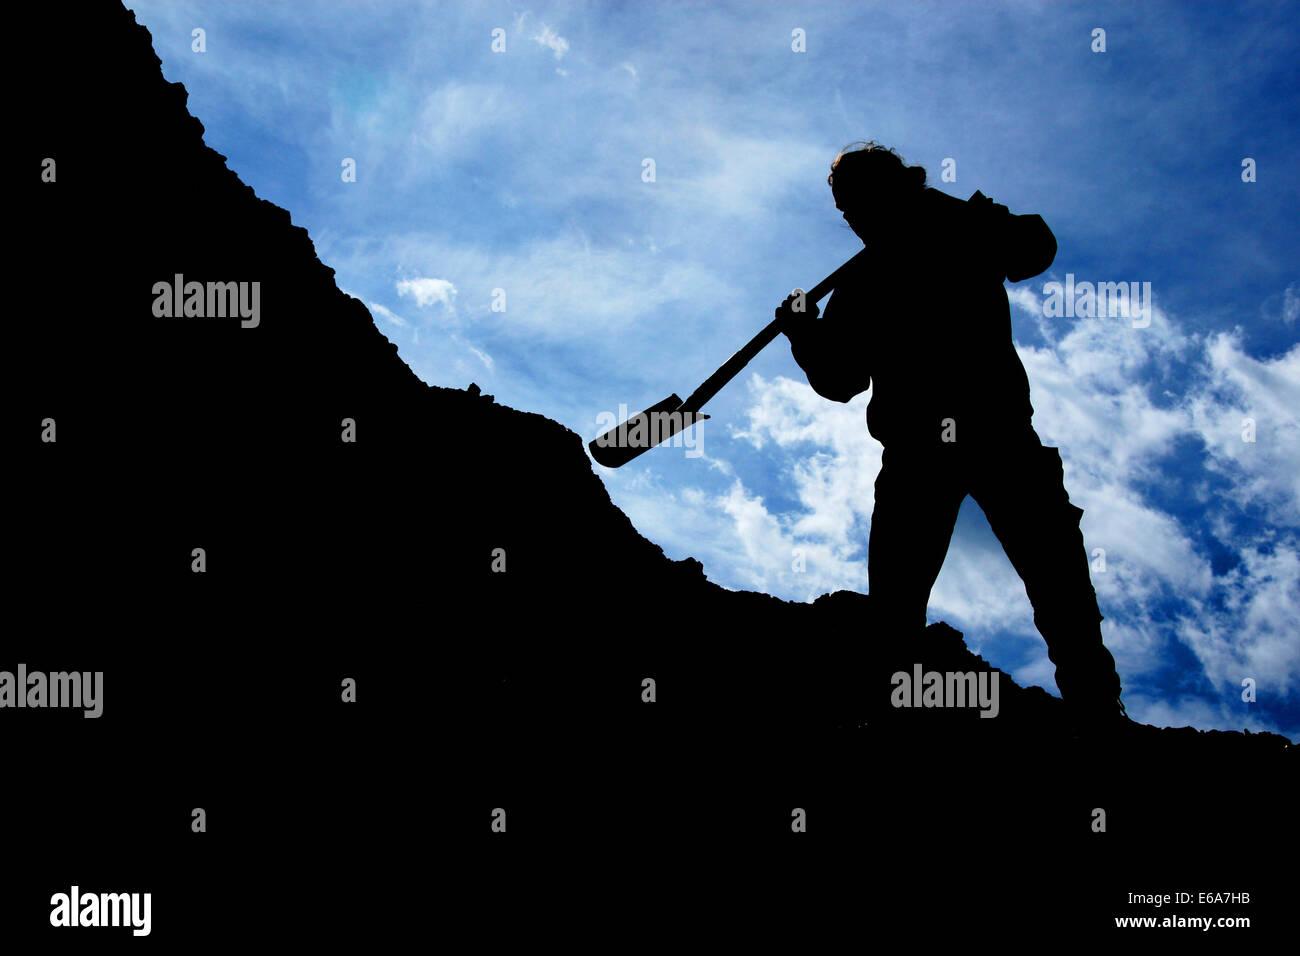 digging - Stock Image